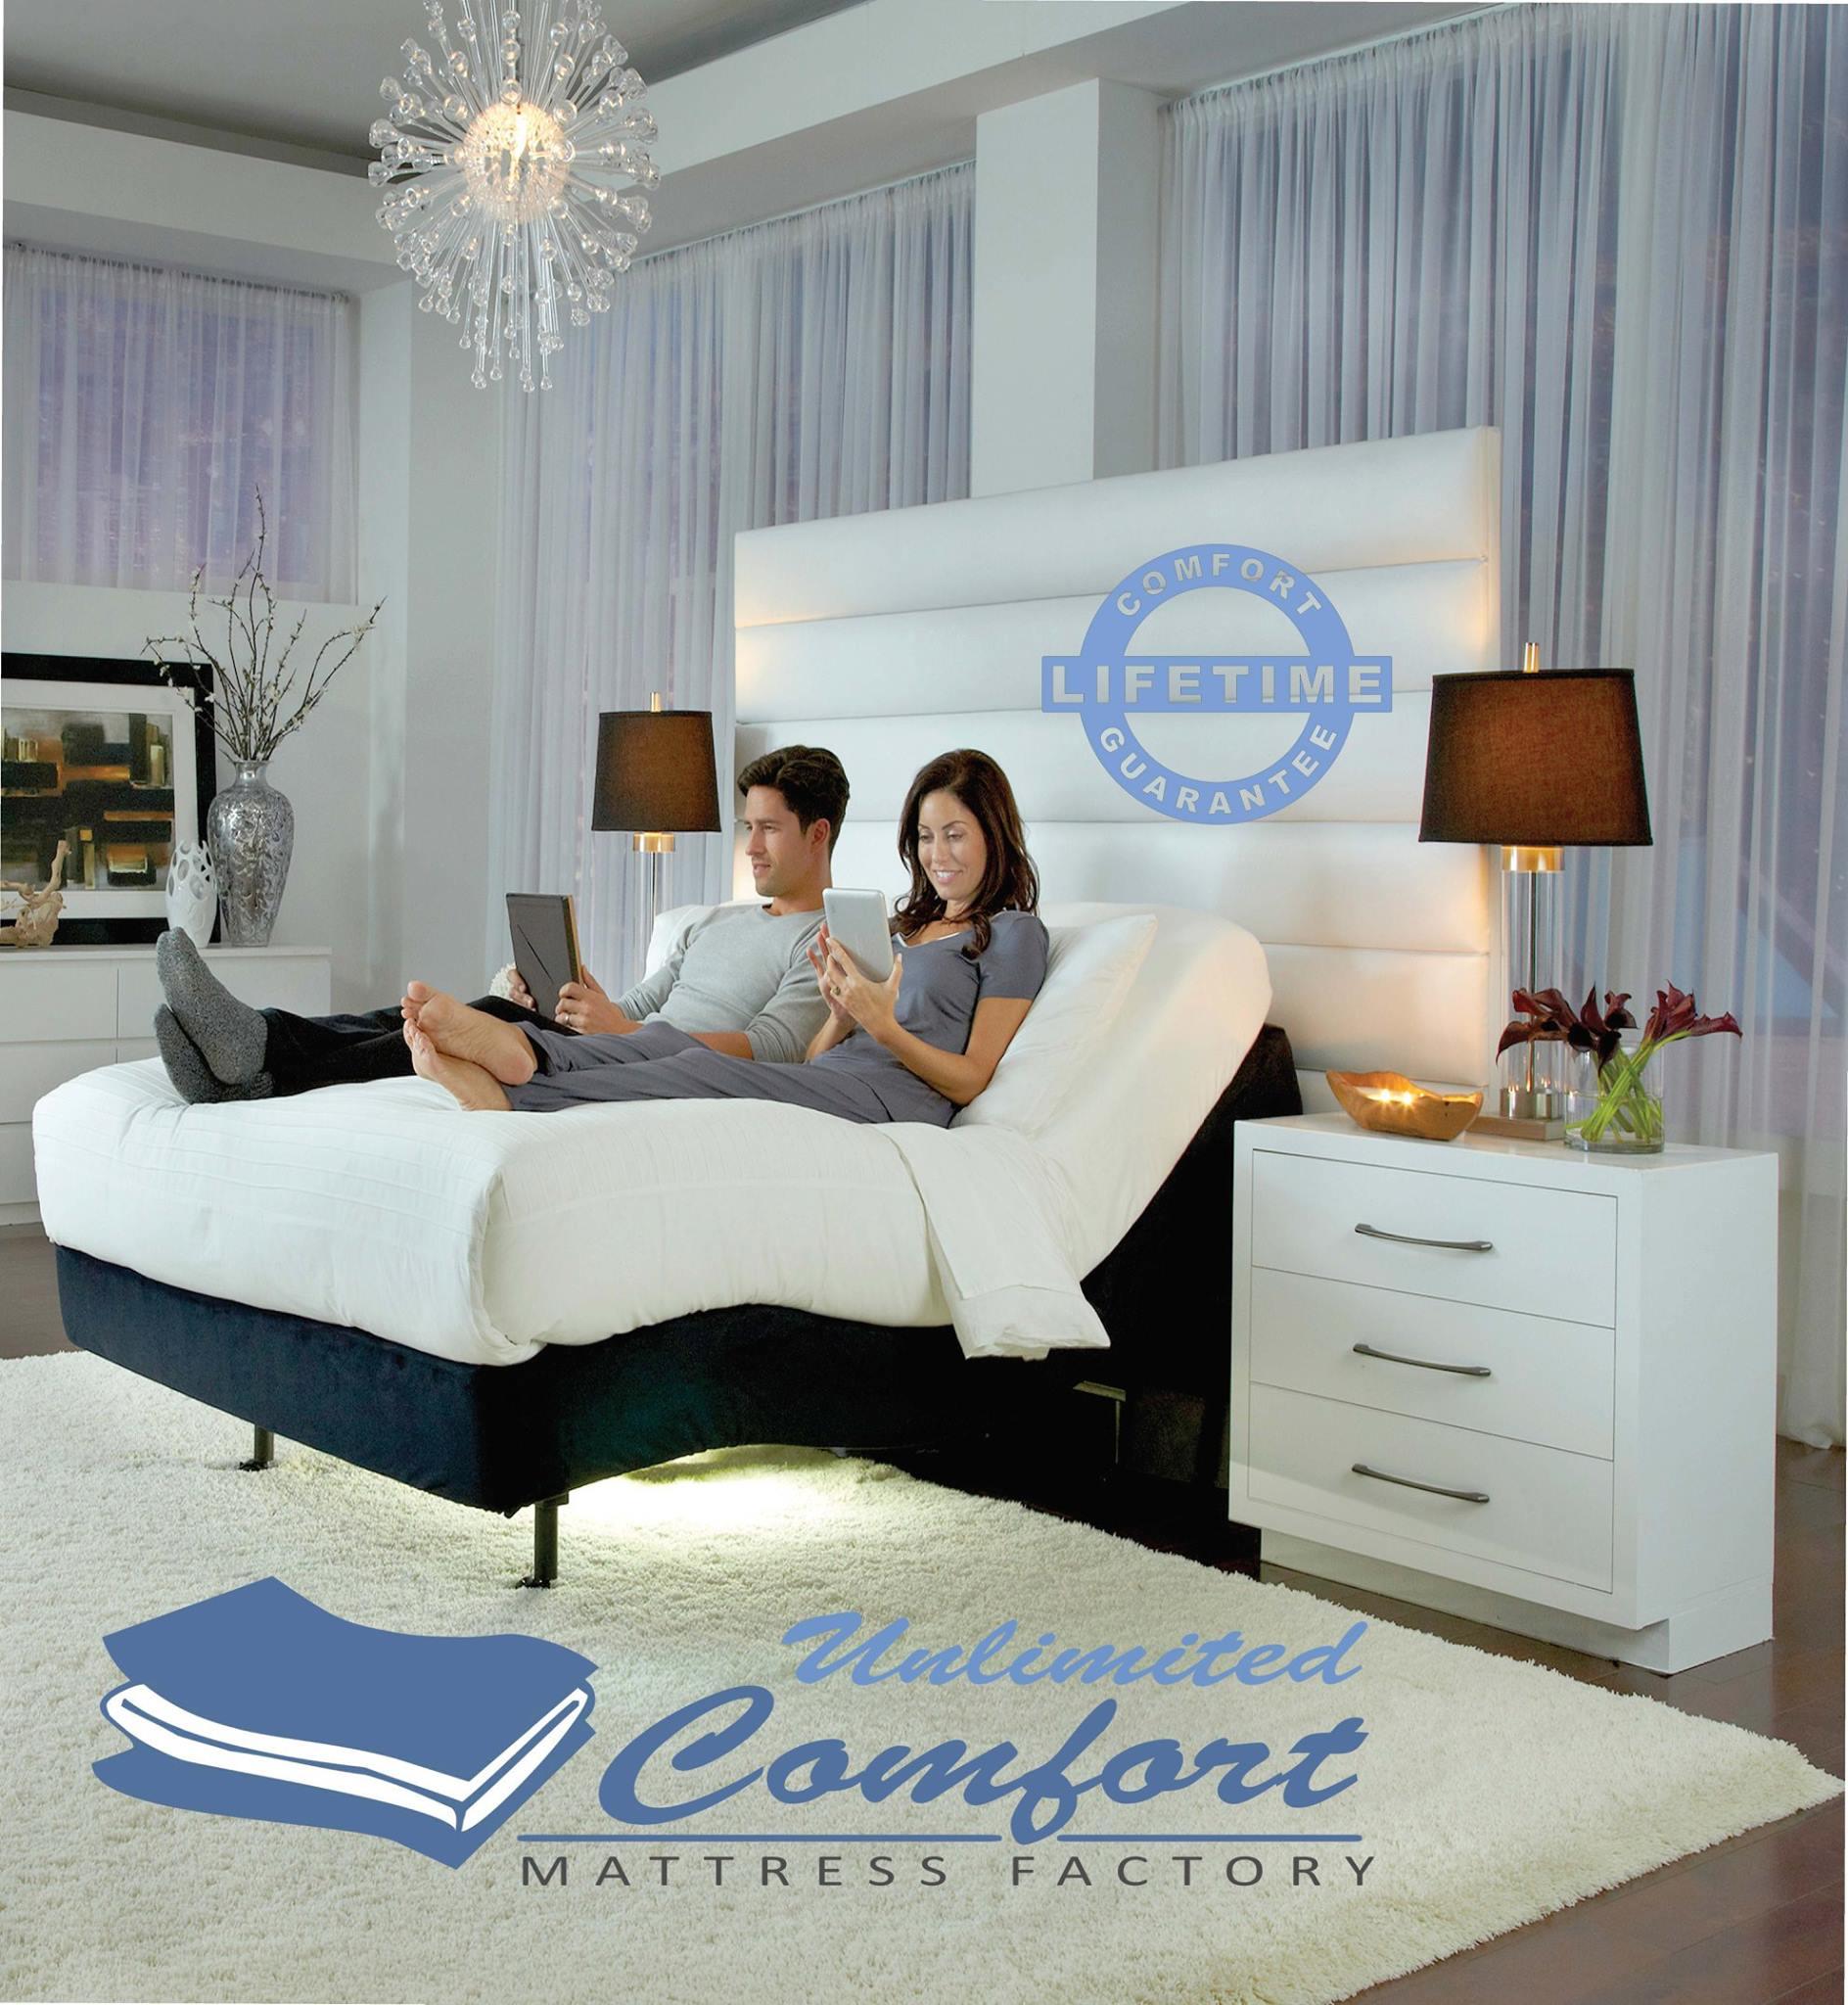 mattress store sarasota unlimited comfort mattress store sarasota